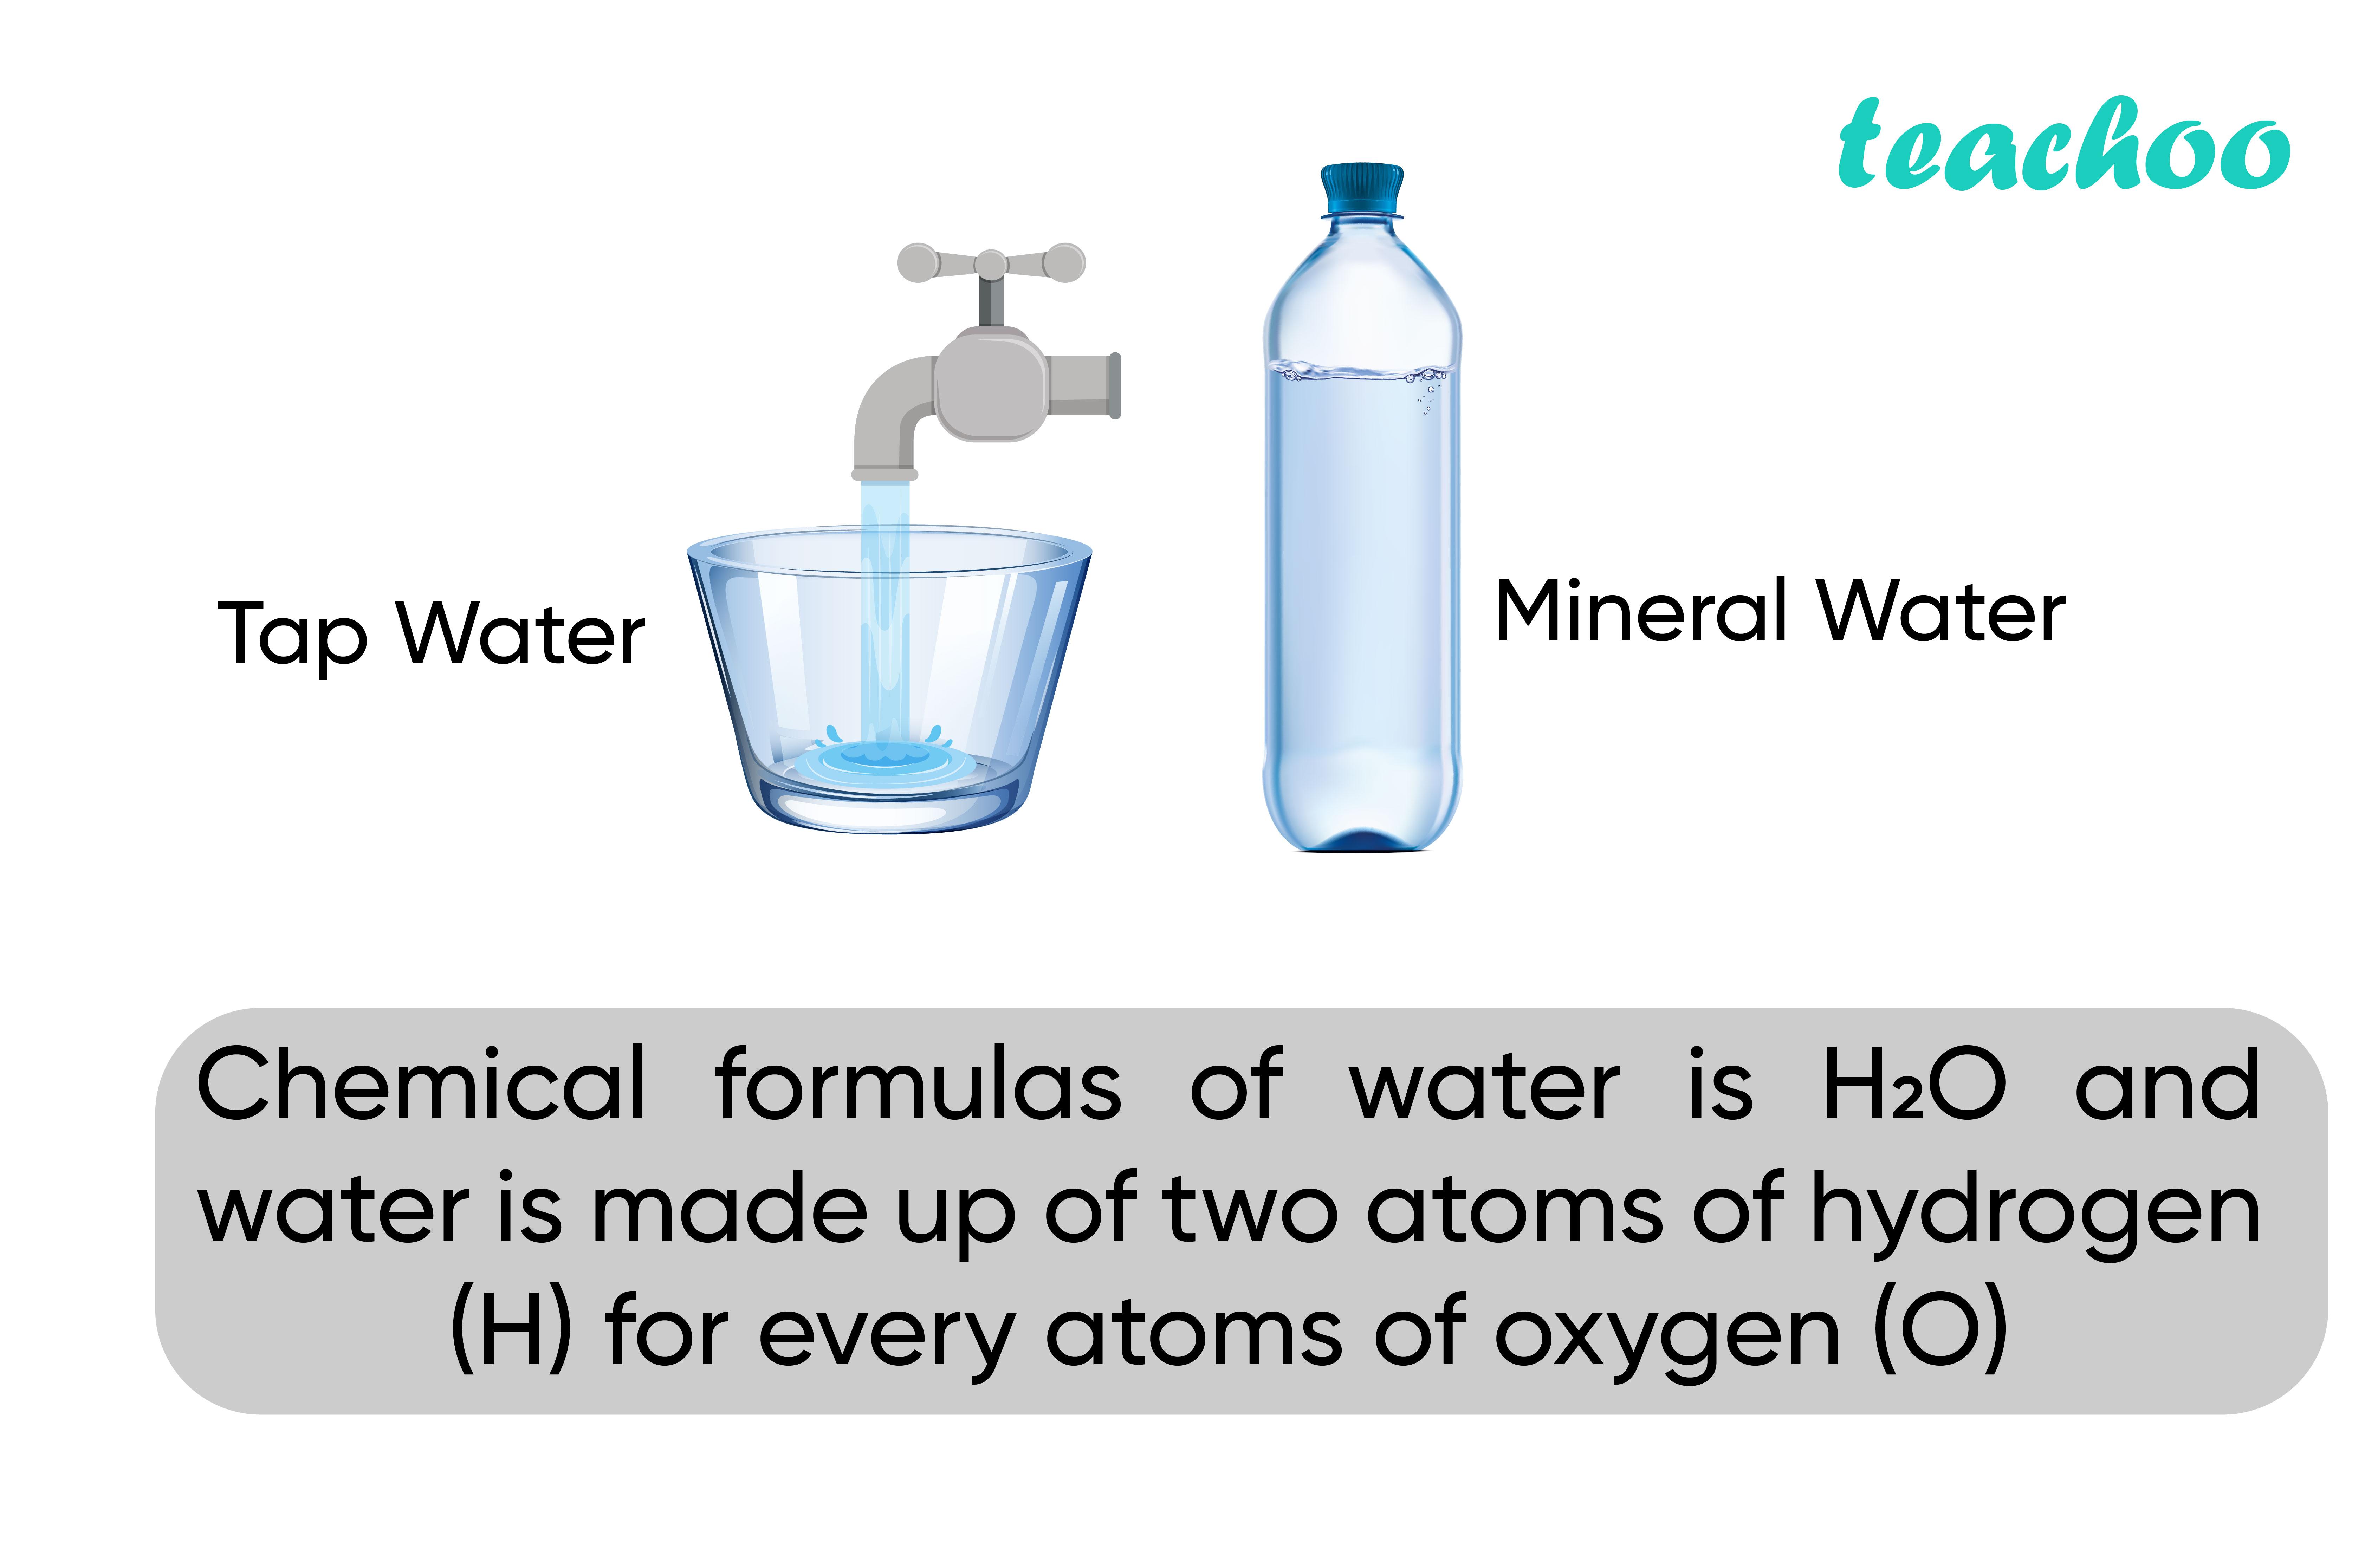 Dalton Atomic Theory (Chemical Formulas) - Teachoo-01.jpg